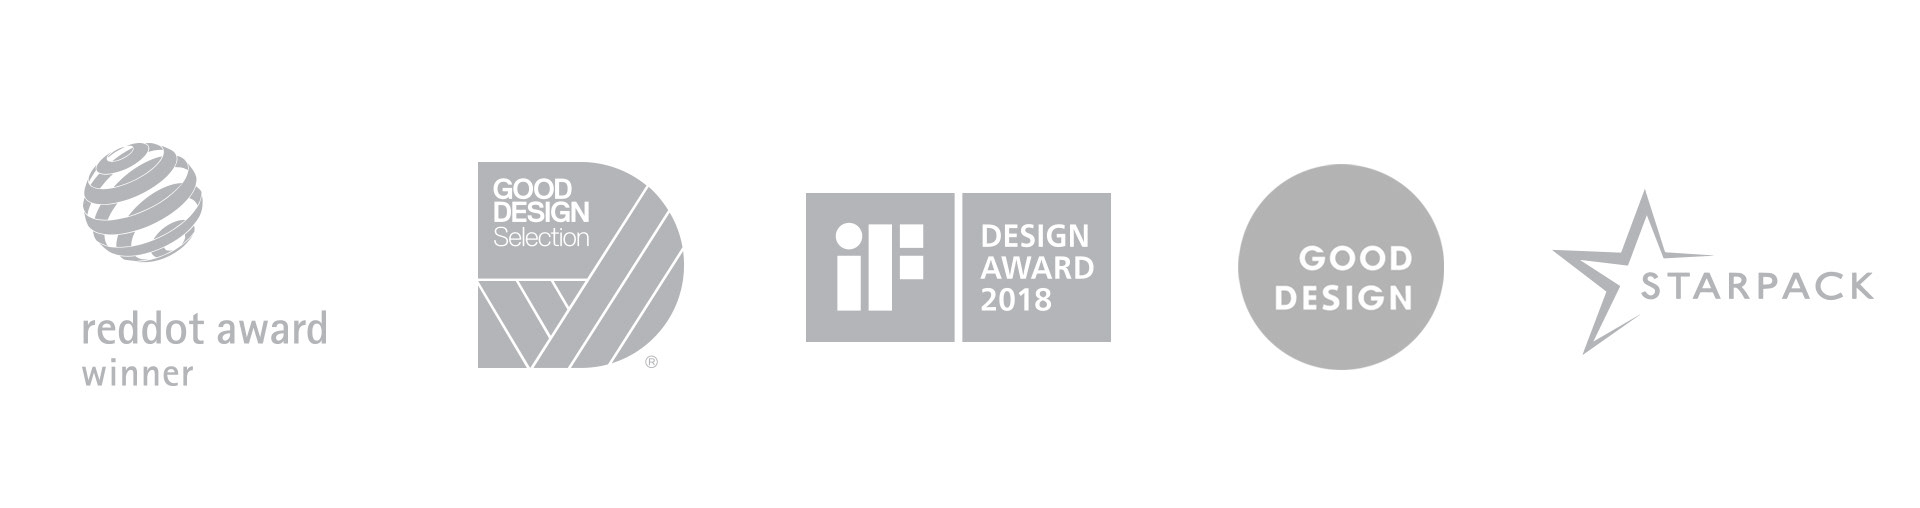 Reddor design award - Good design award - iF design award - Starpack - logos